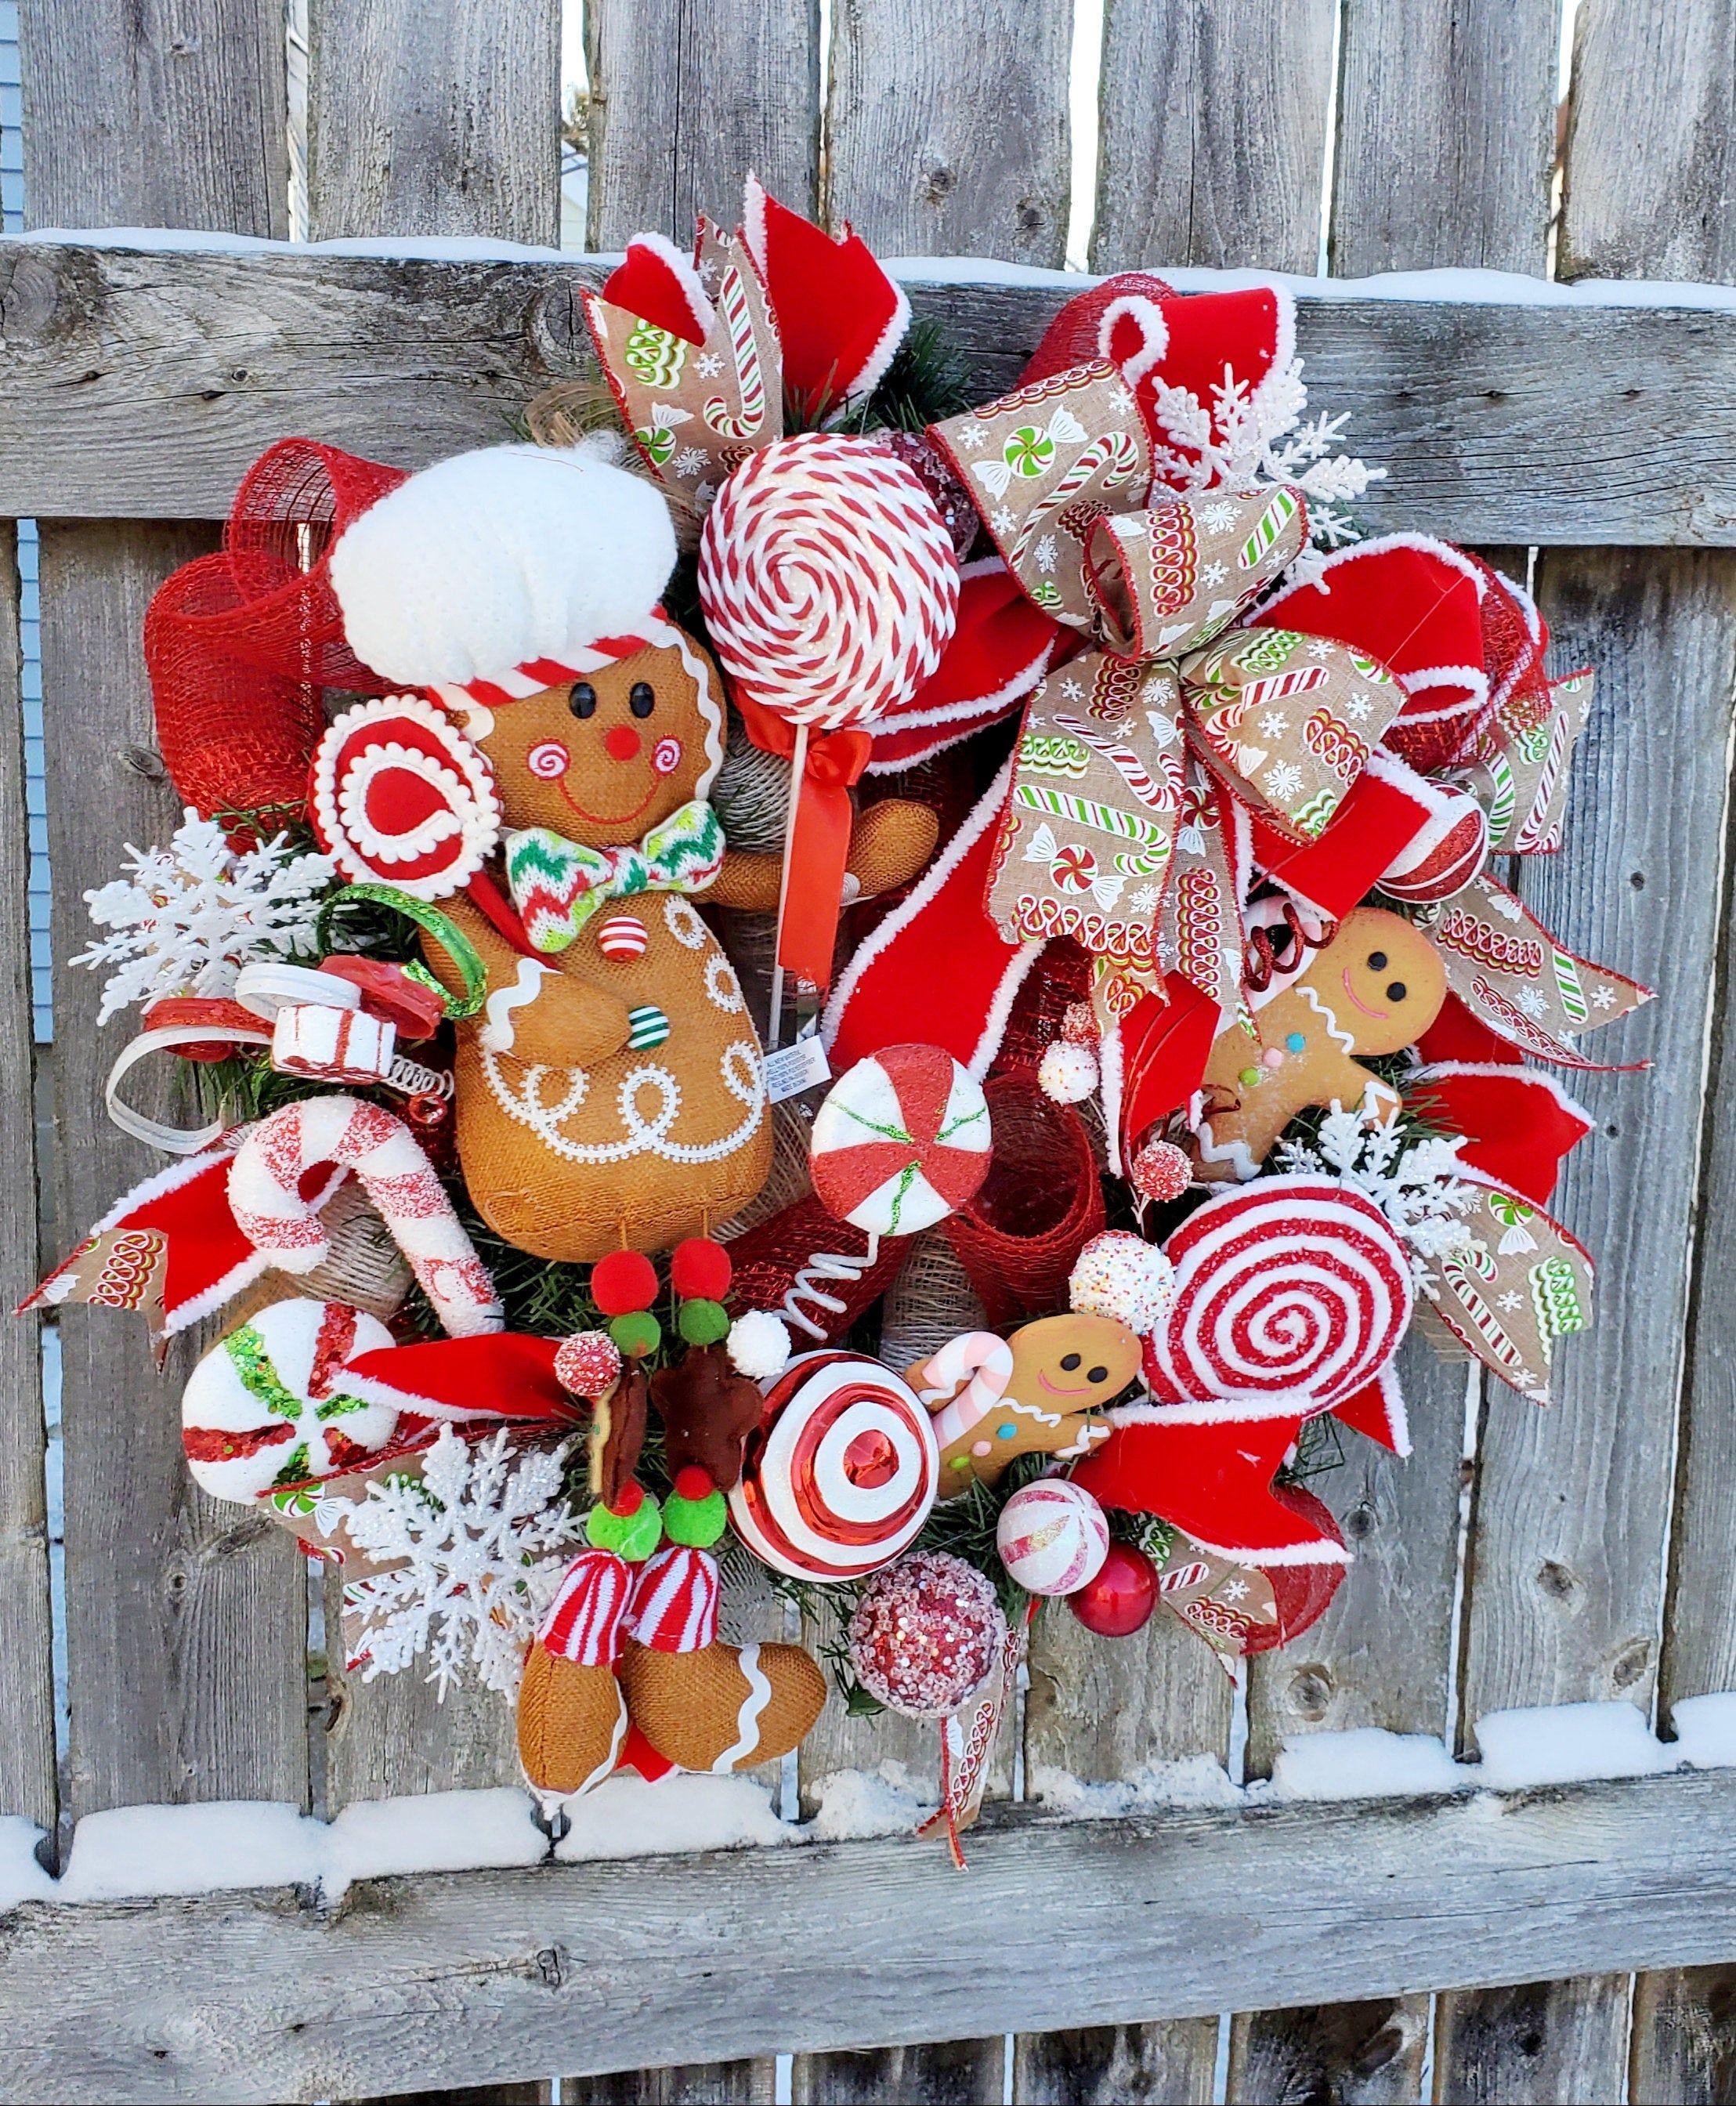 Sparkling Gingerbread Man Christmas Wreath Gingerbread Wreath Christmas Wreath Lollipop Wreath In 2020 Holiday Wreaths Christmas Door Decorations Christmas Wreaths